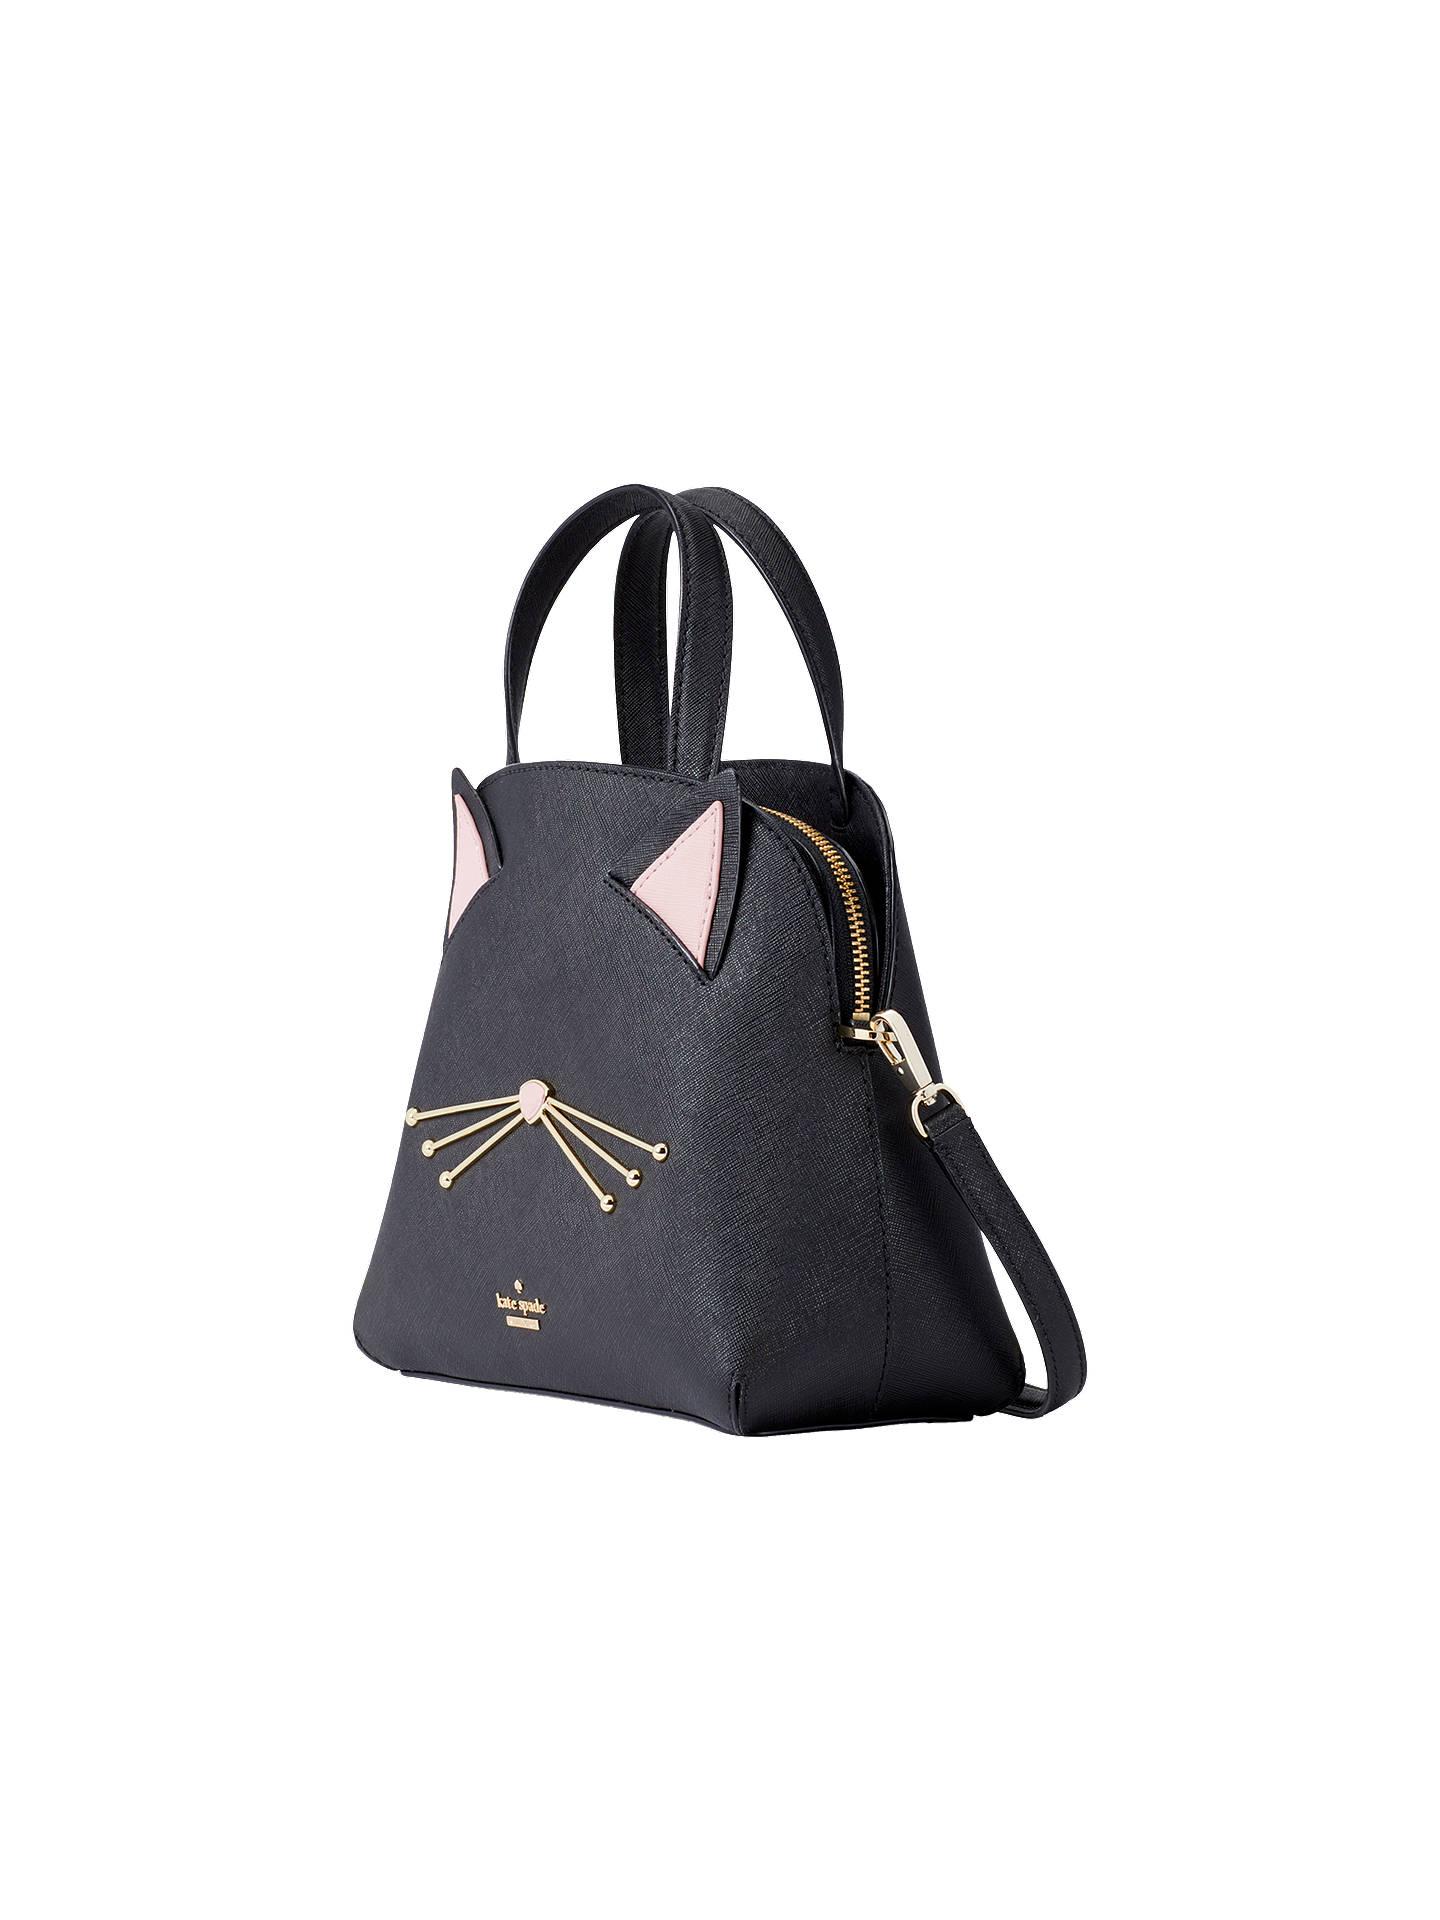 dd8af25cf3ce ... Buy kate spade new york Cat s Meow Lottie Leather Grab Bag